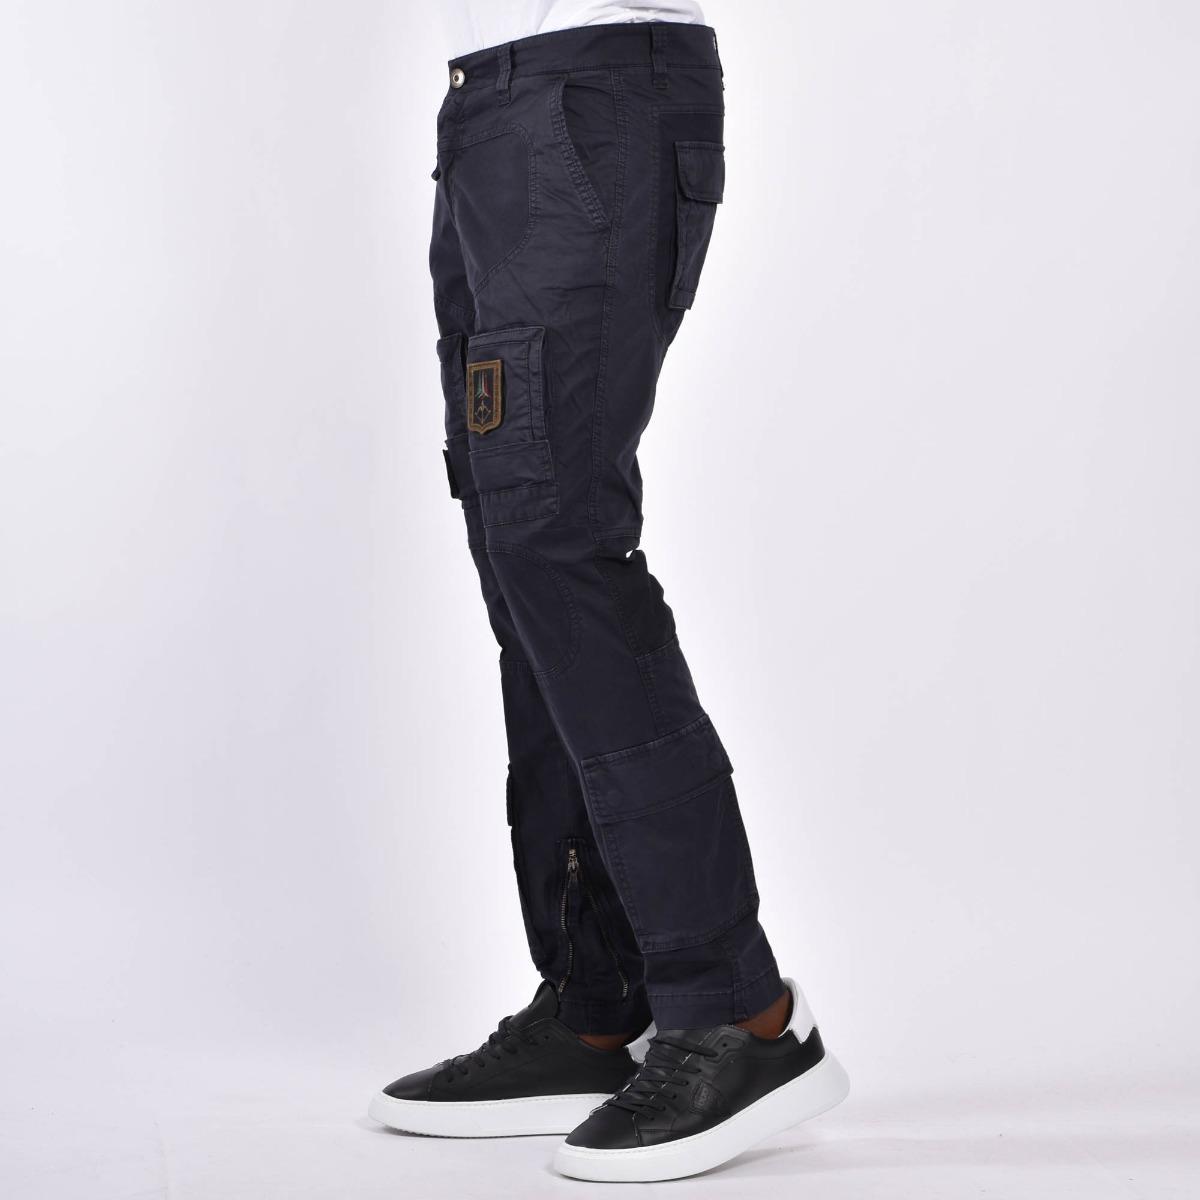 Pantalone anti-g tasconi - Blu scuro